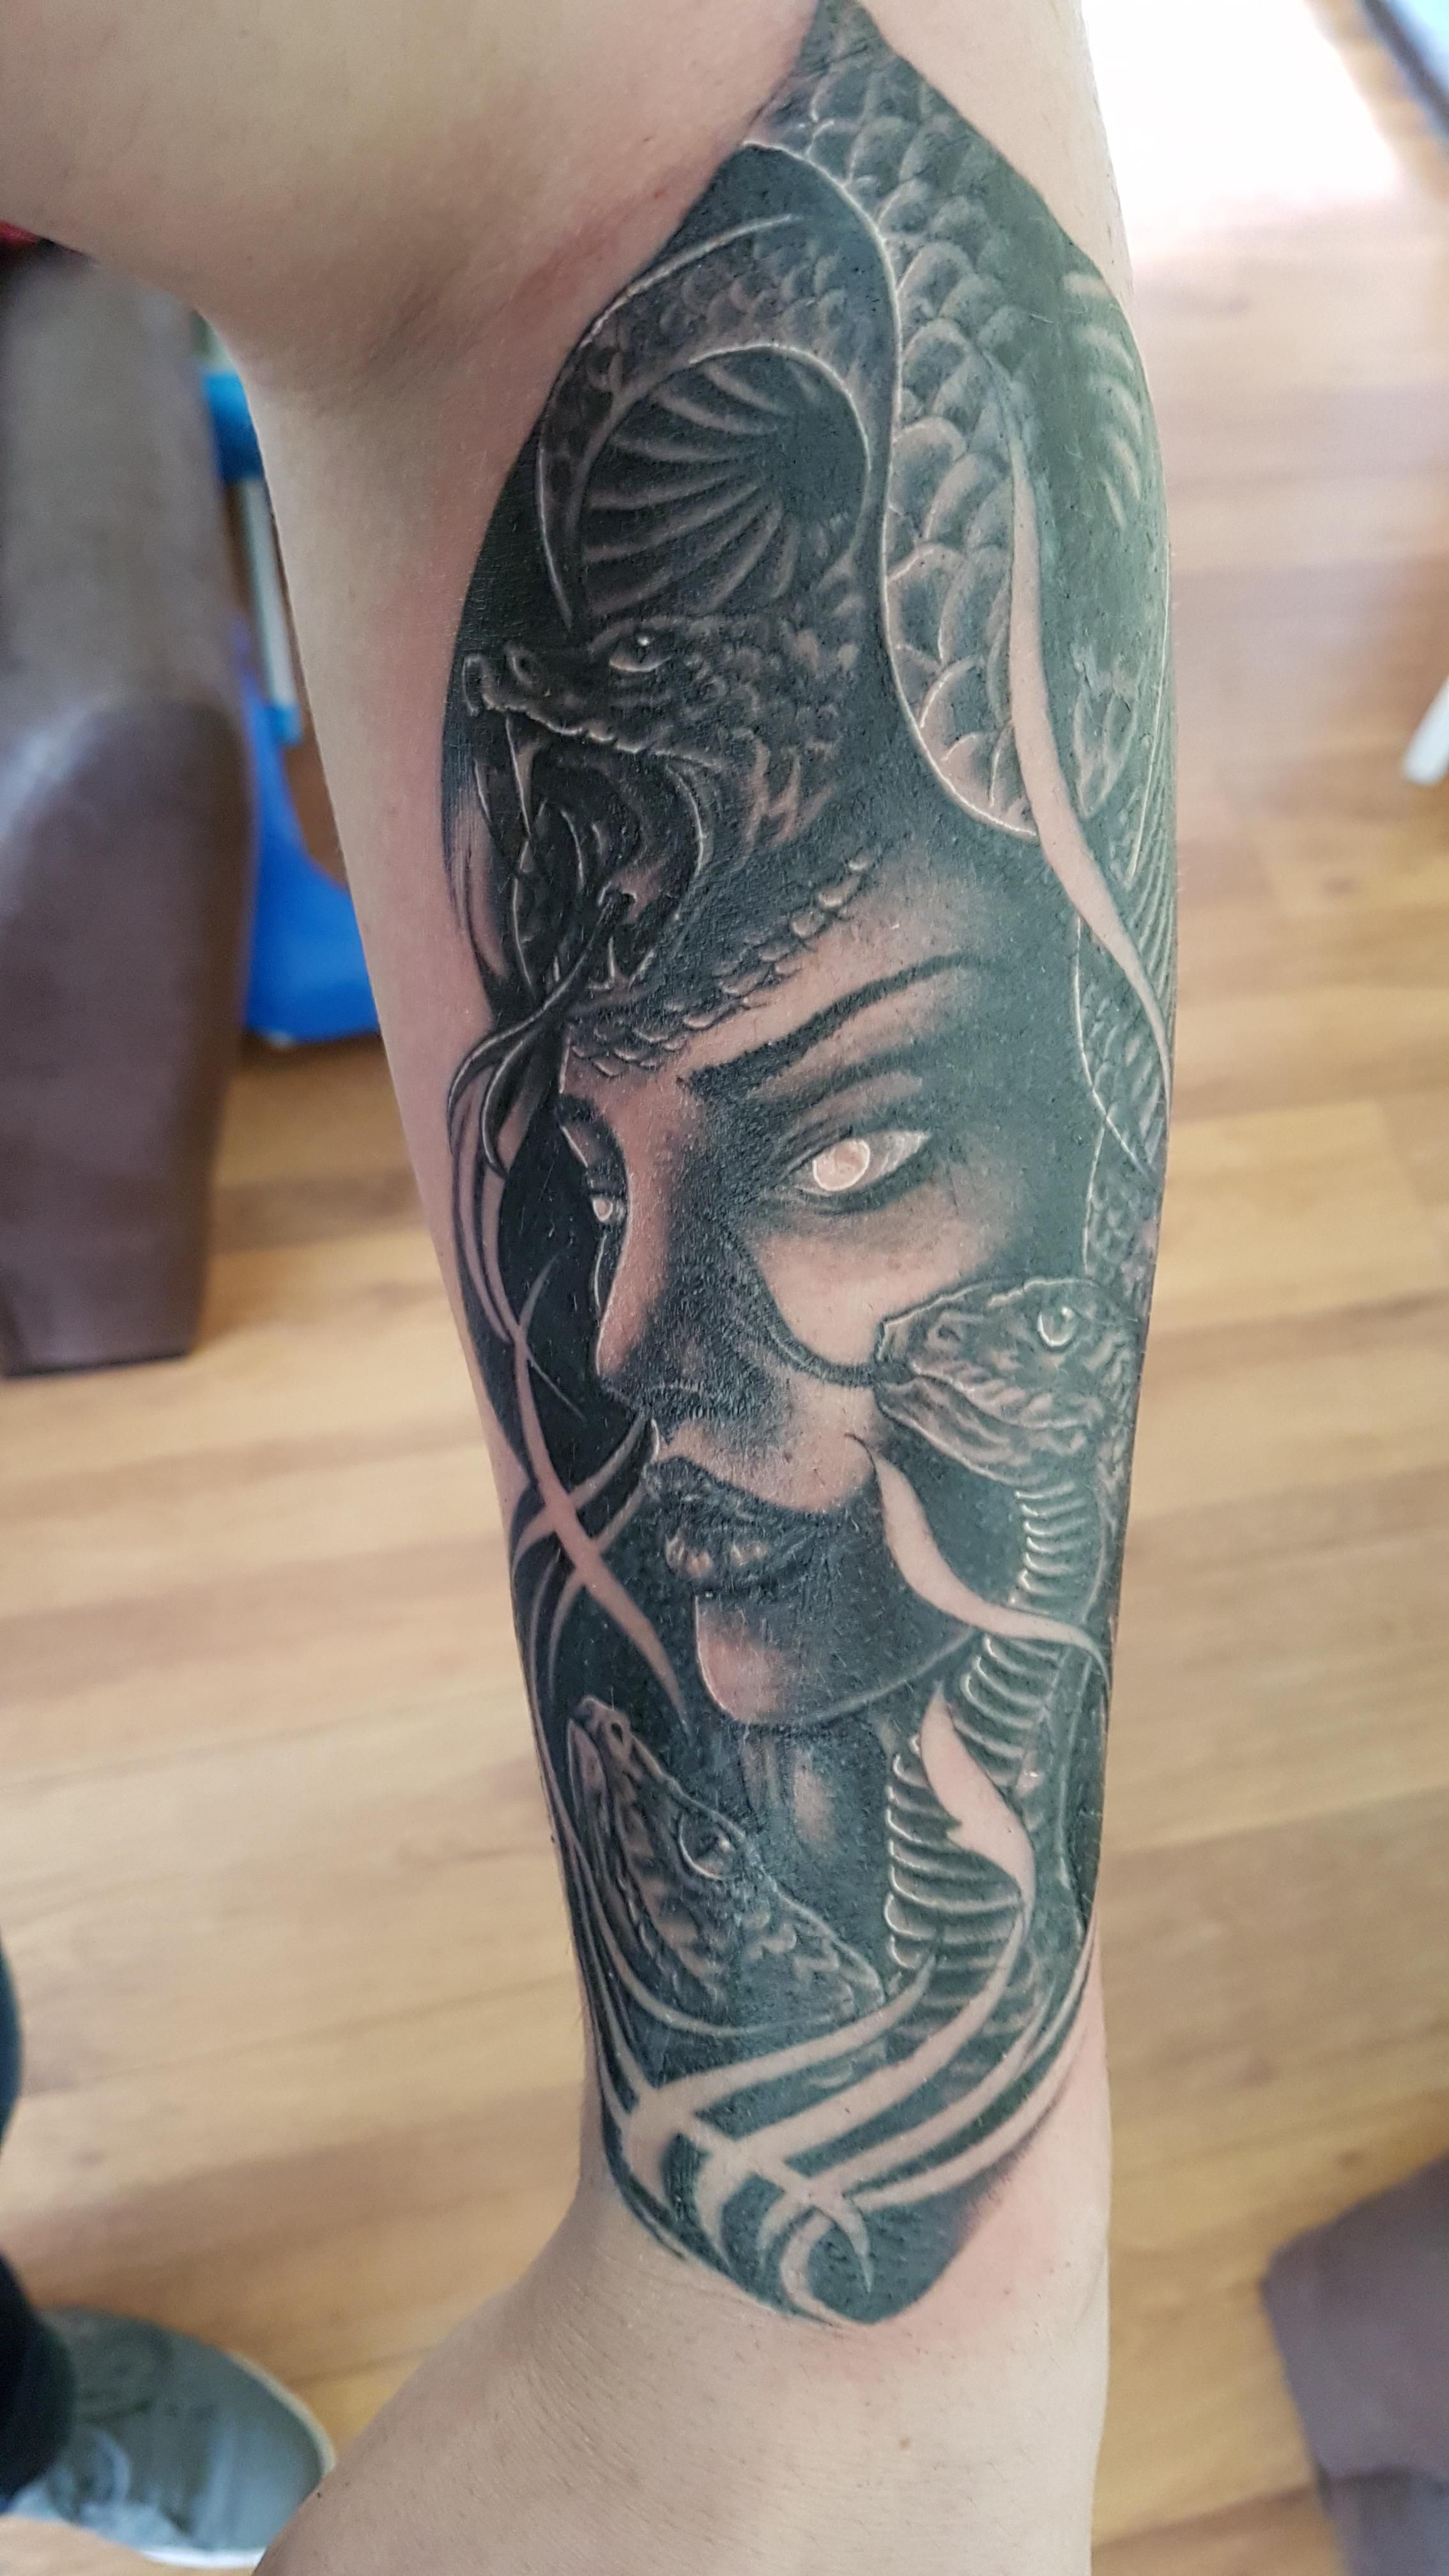 Medusa Second Session Of My Greek Mythology Sleeve By Grant Chameleons Tattoo London Japanese Tattoo Sleeve Greek Tattoos Tattoos Greek Mythology Tattoos